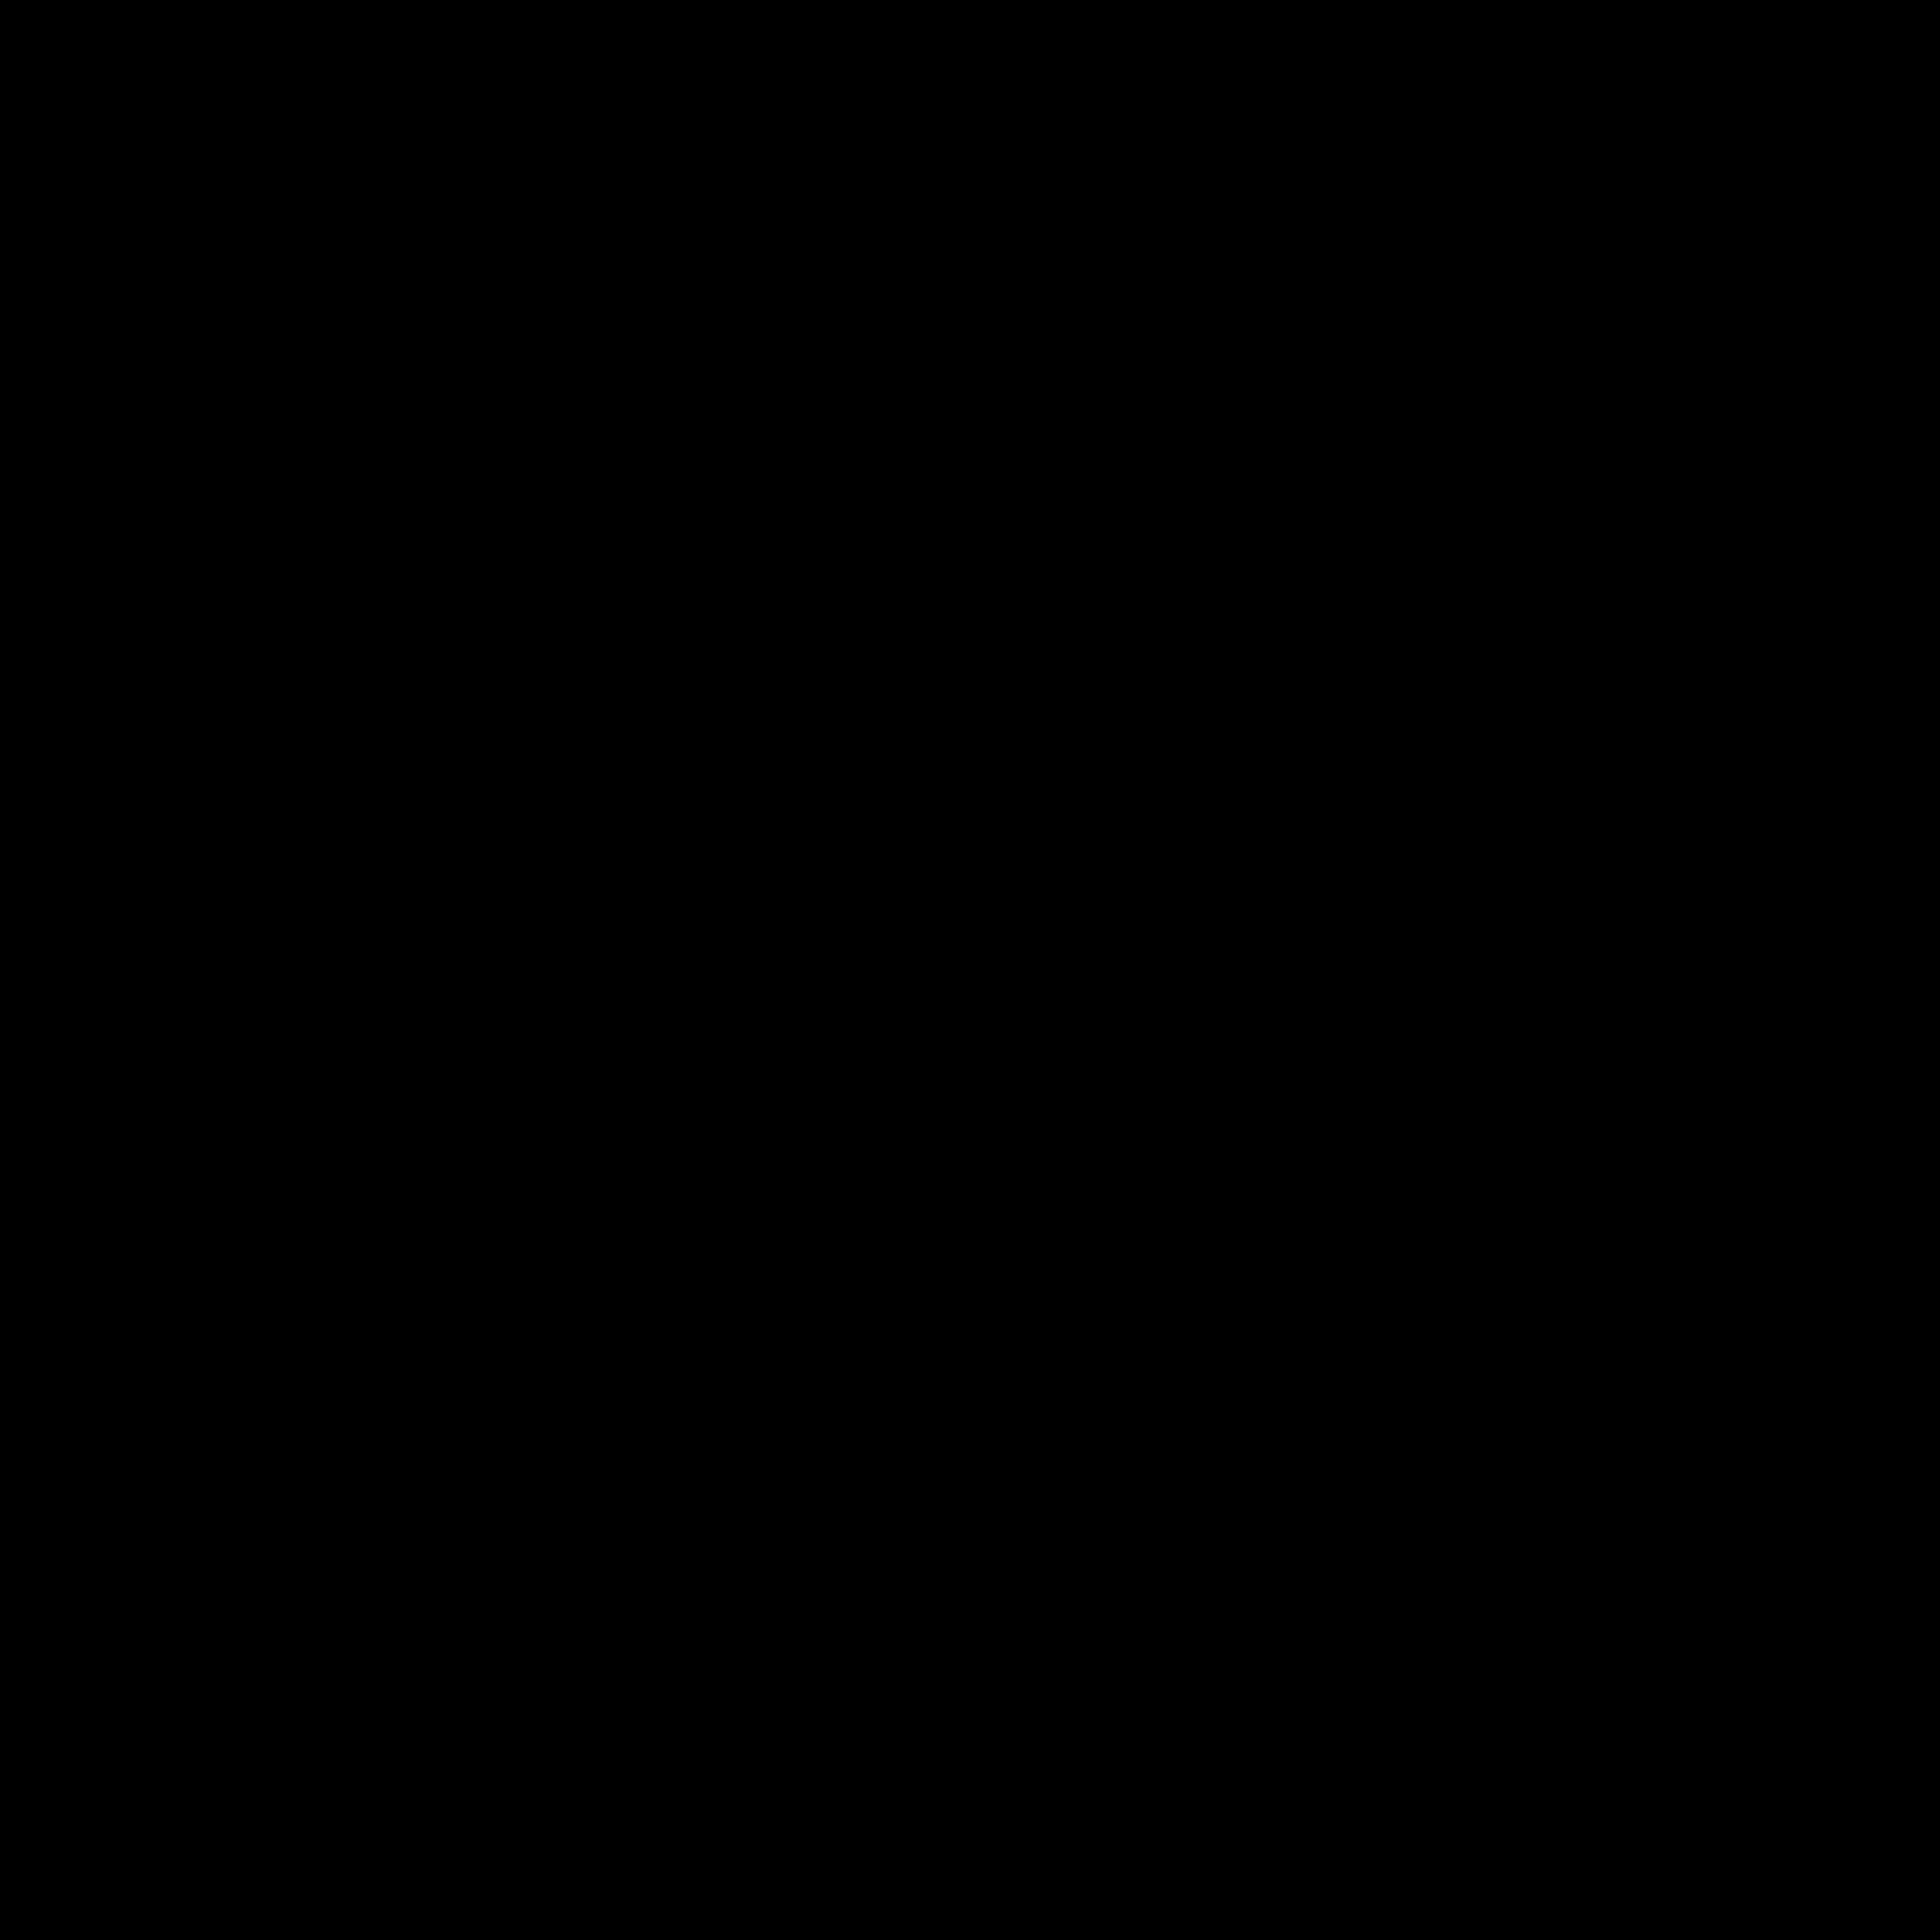 spiral logo 0 - Spiral Logo